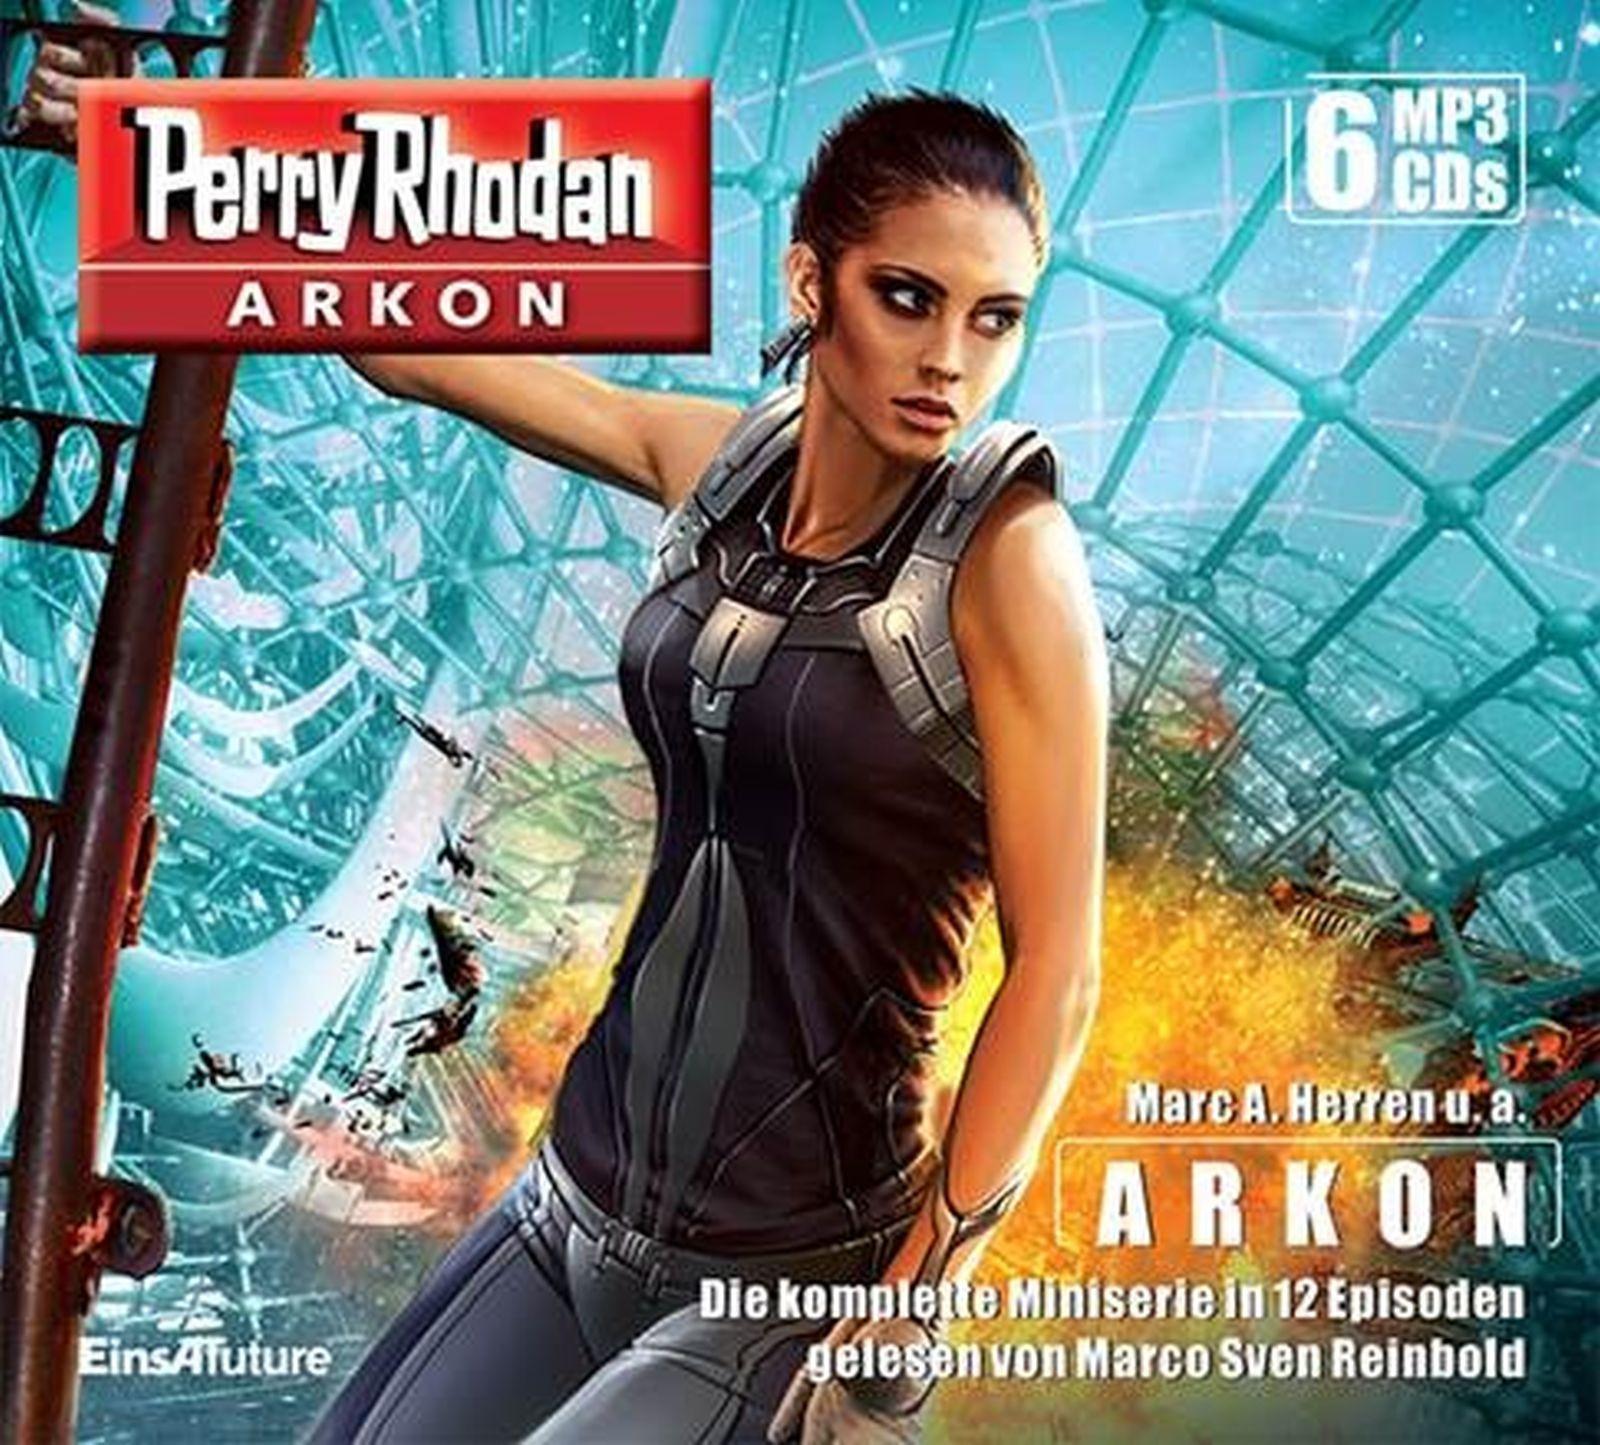 Perry Rhodan ARKON